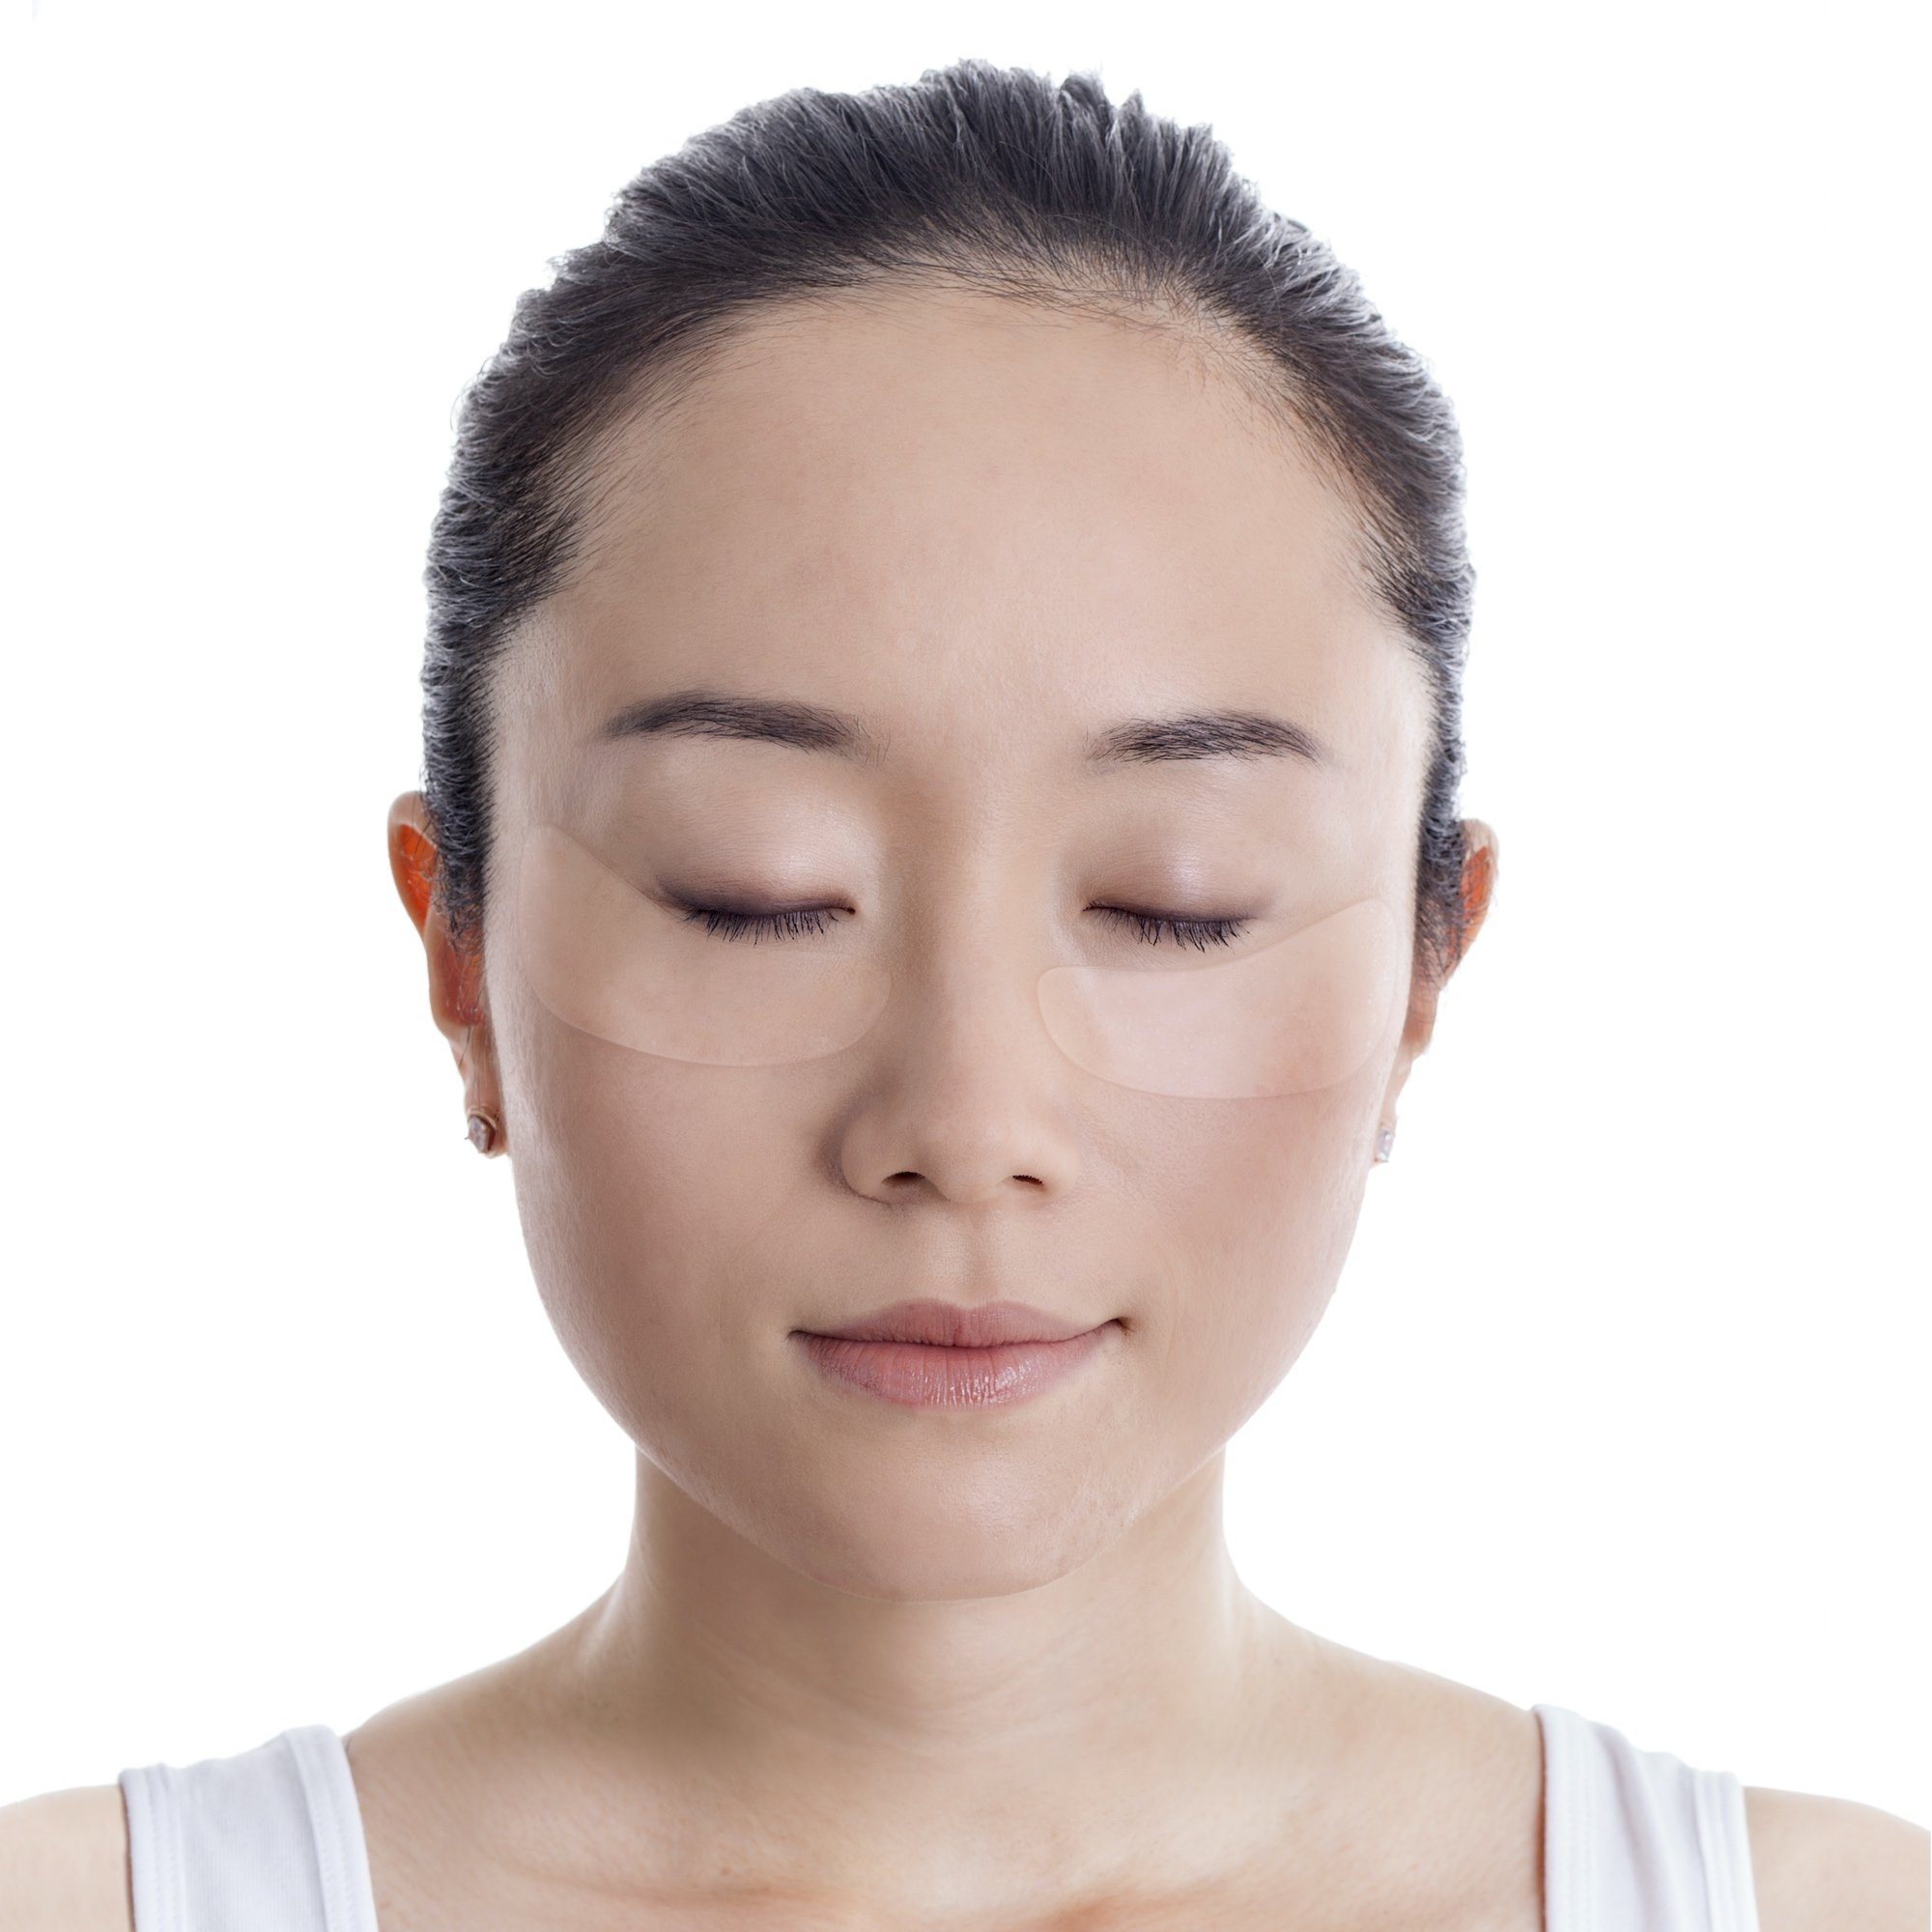 Eye Lift and Smoothing Kit - Peach Wrinkles Schminkles 7